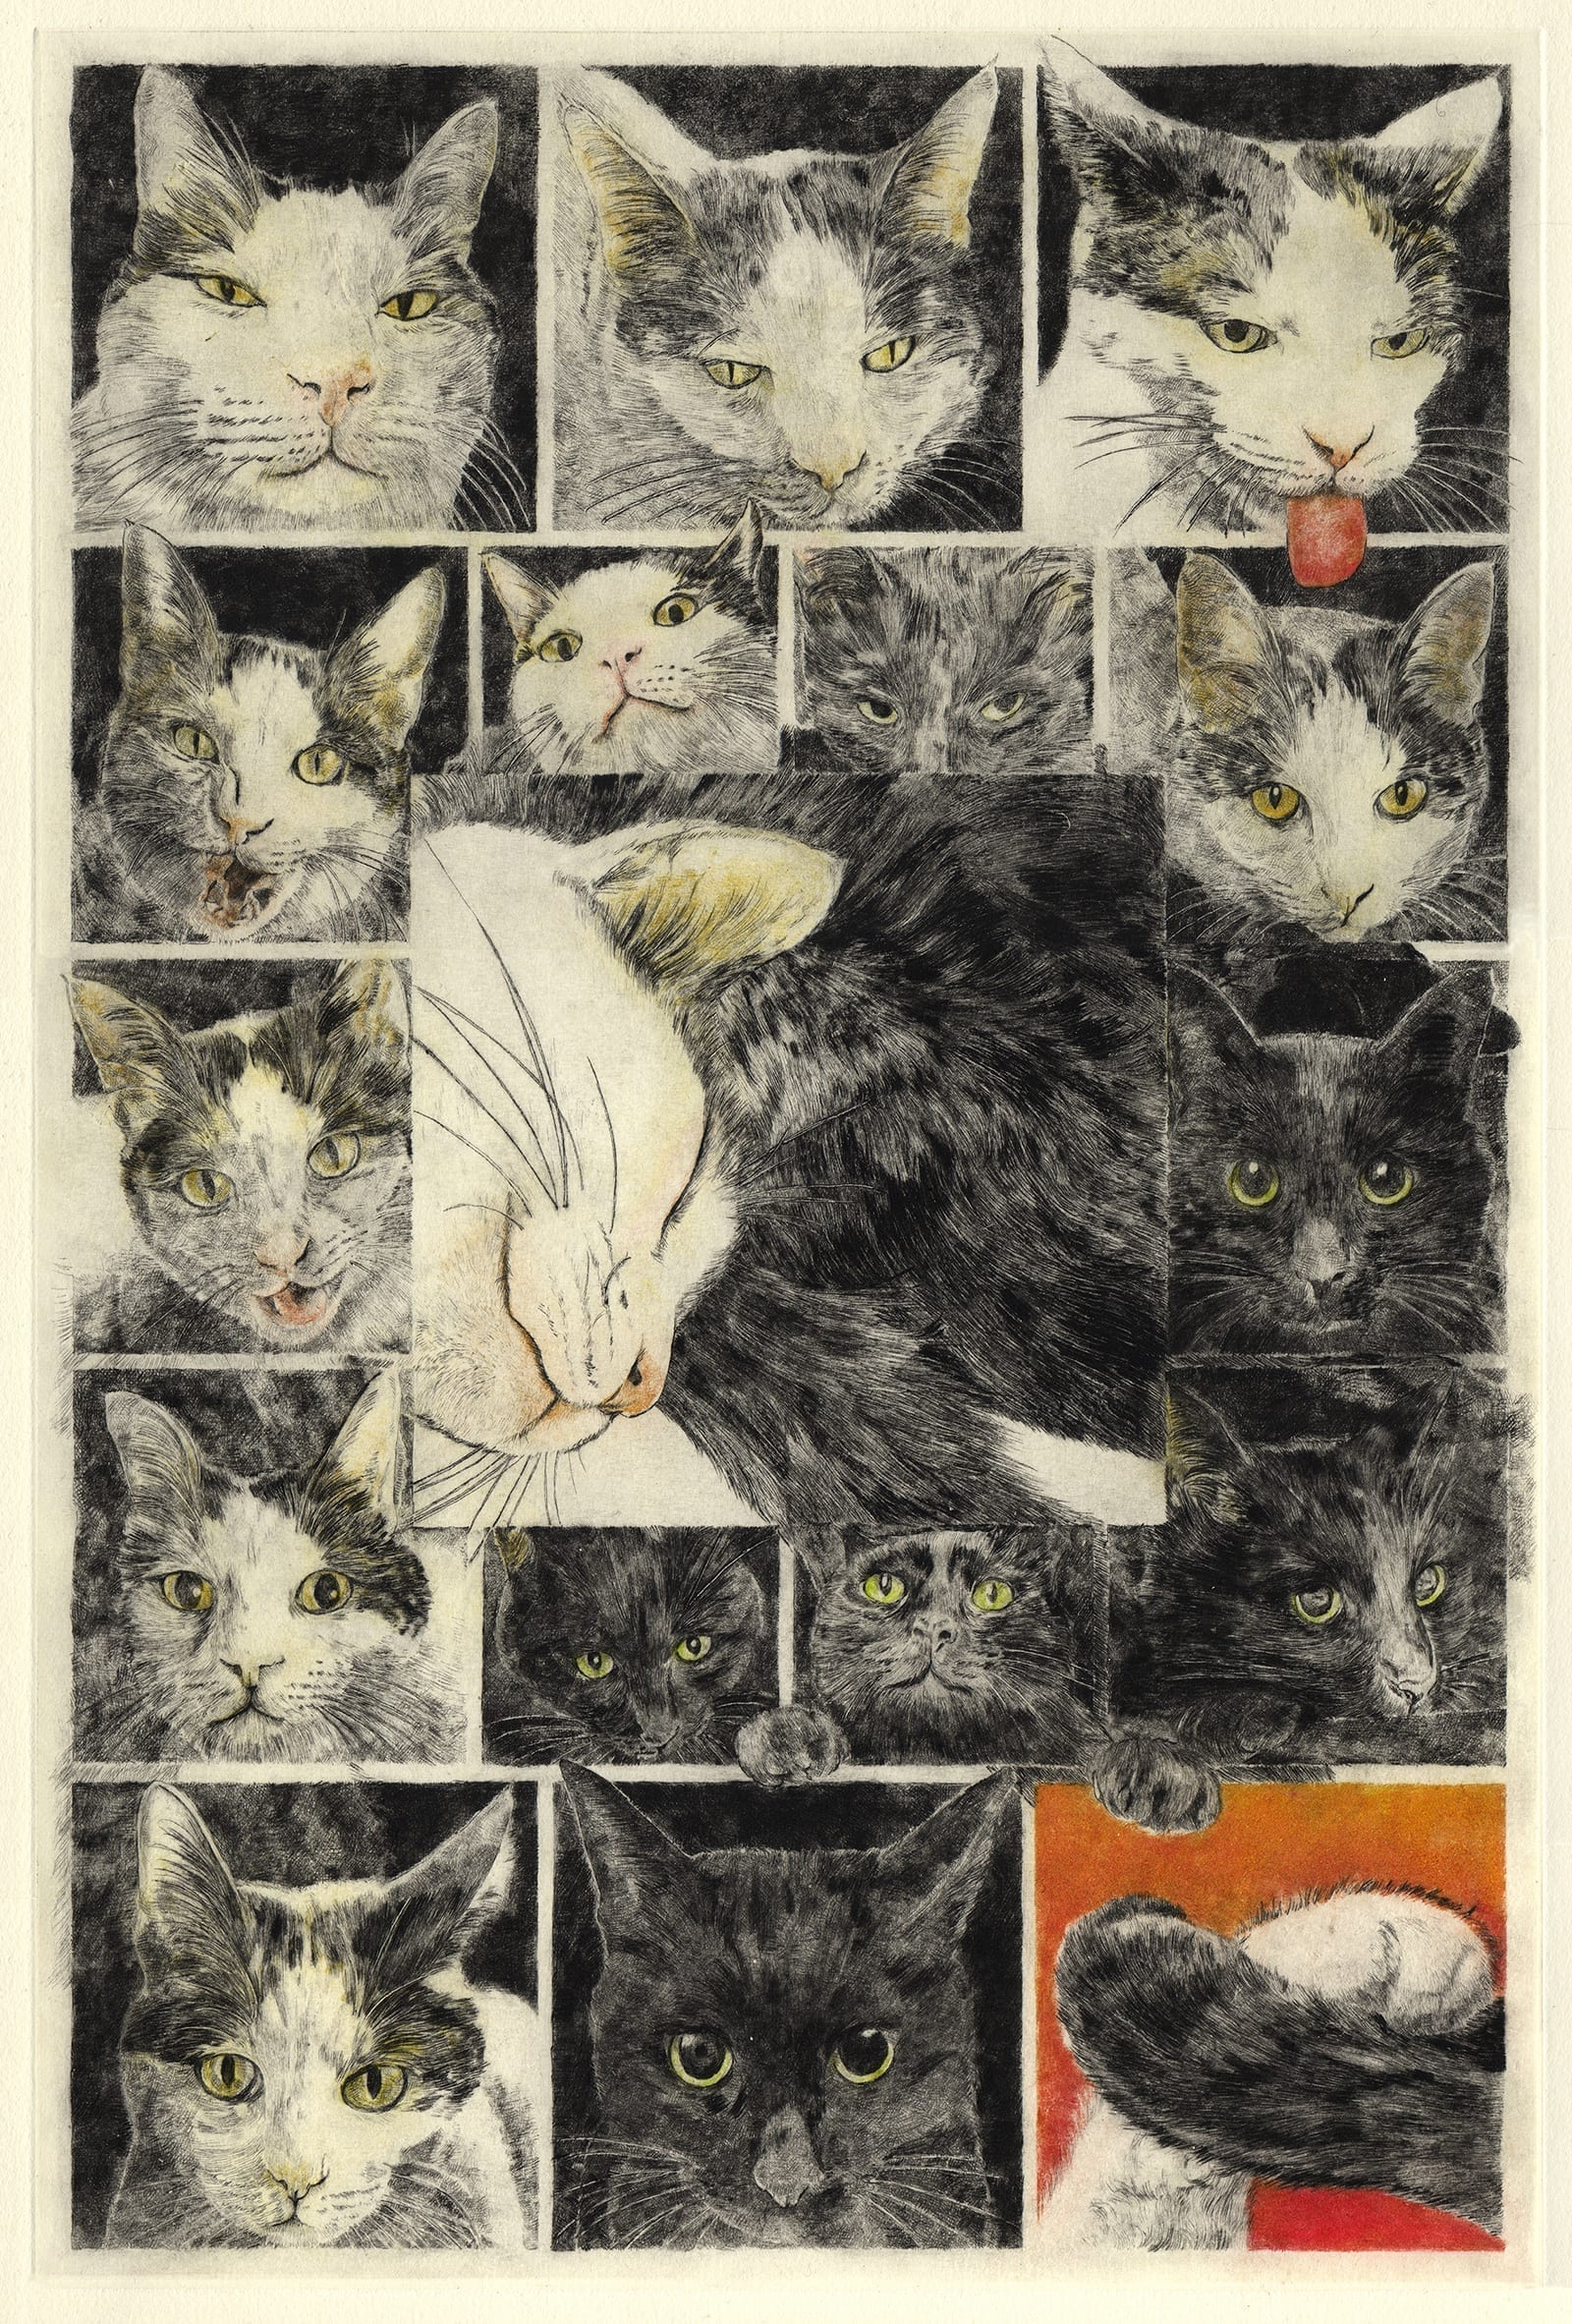 Kiseki (drypoint etching by Yaemi Shigyo)